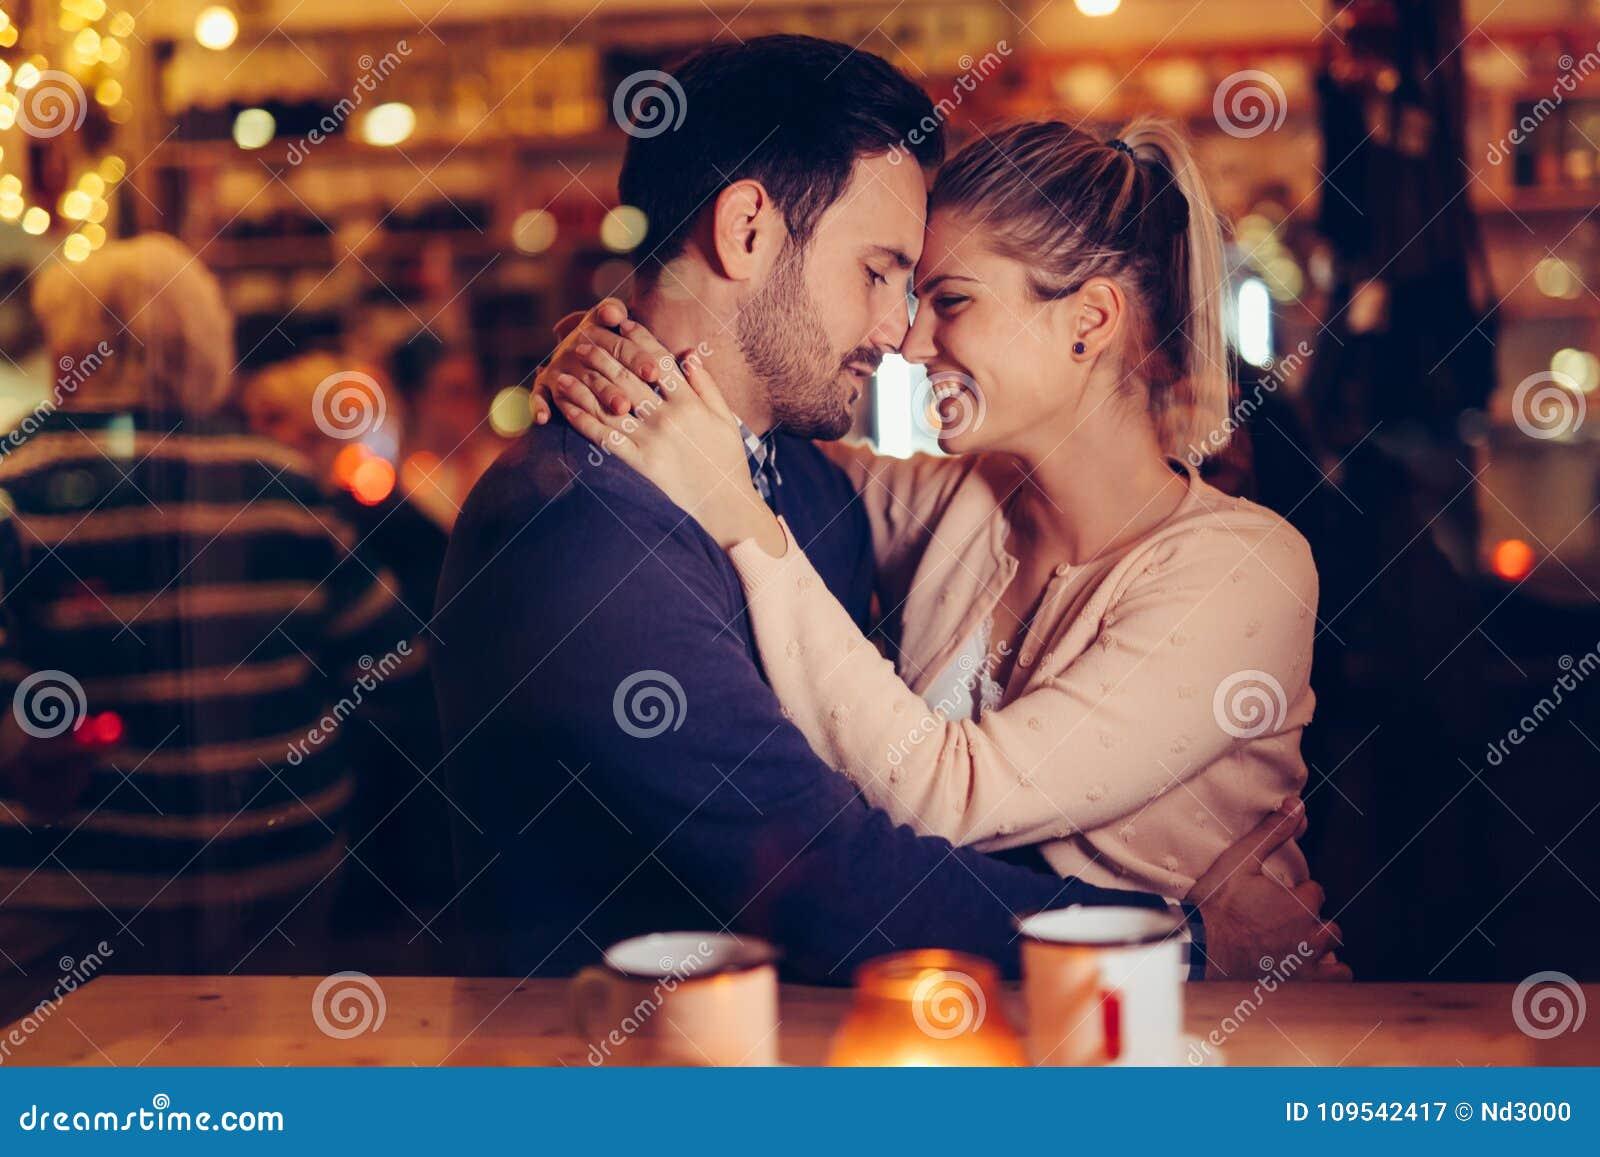 discord dating servers 12+